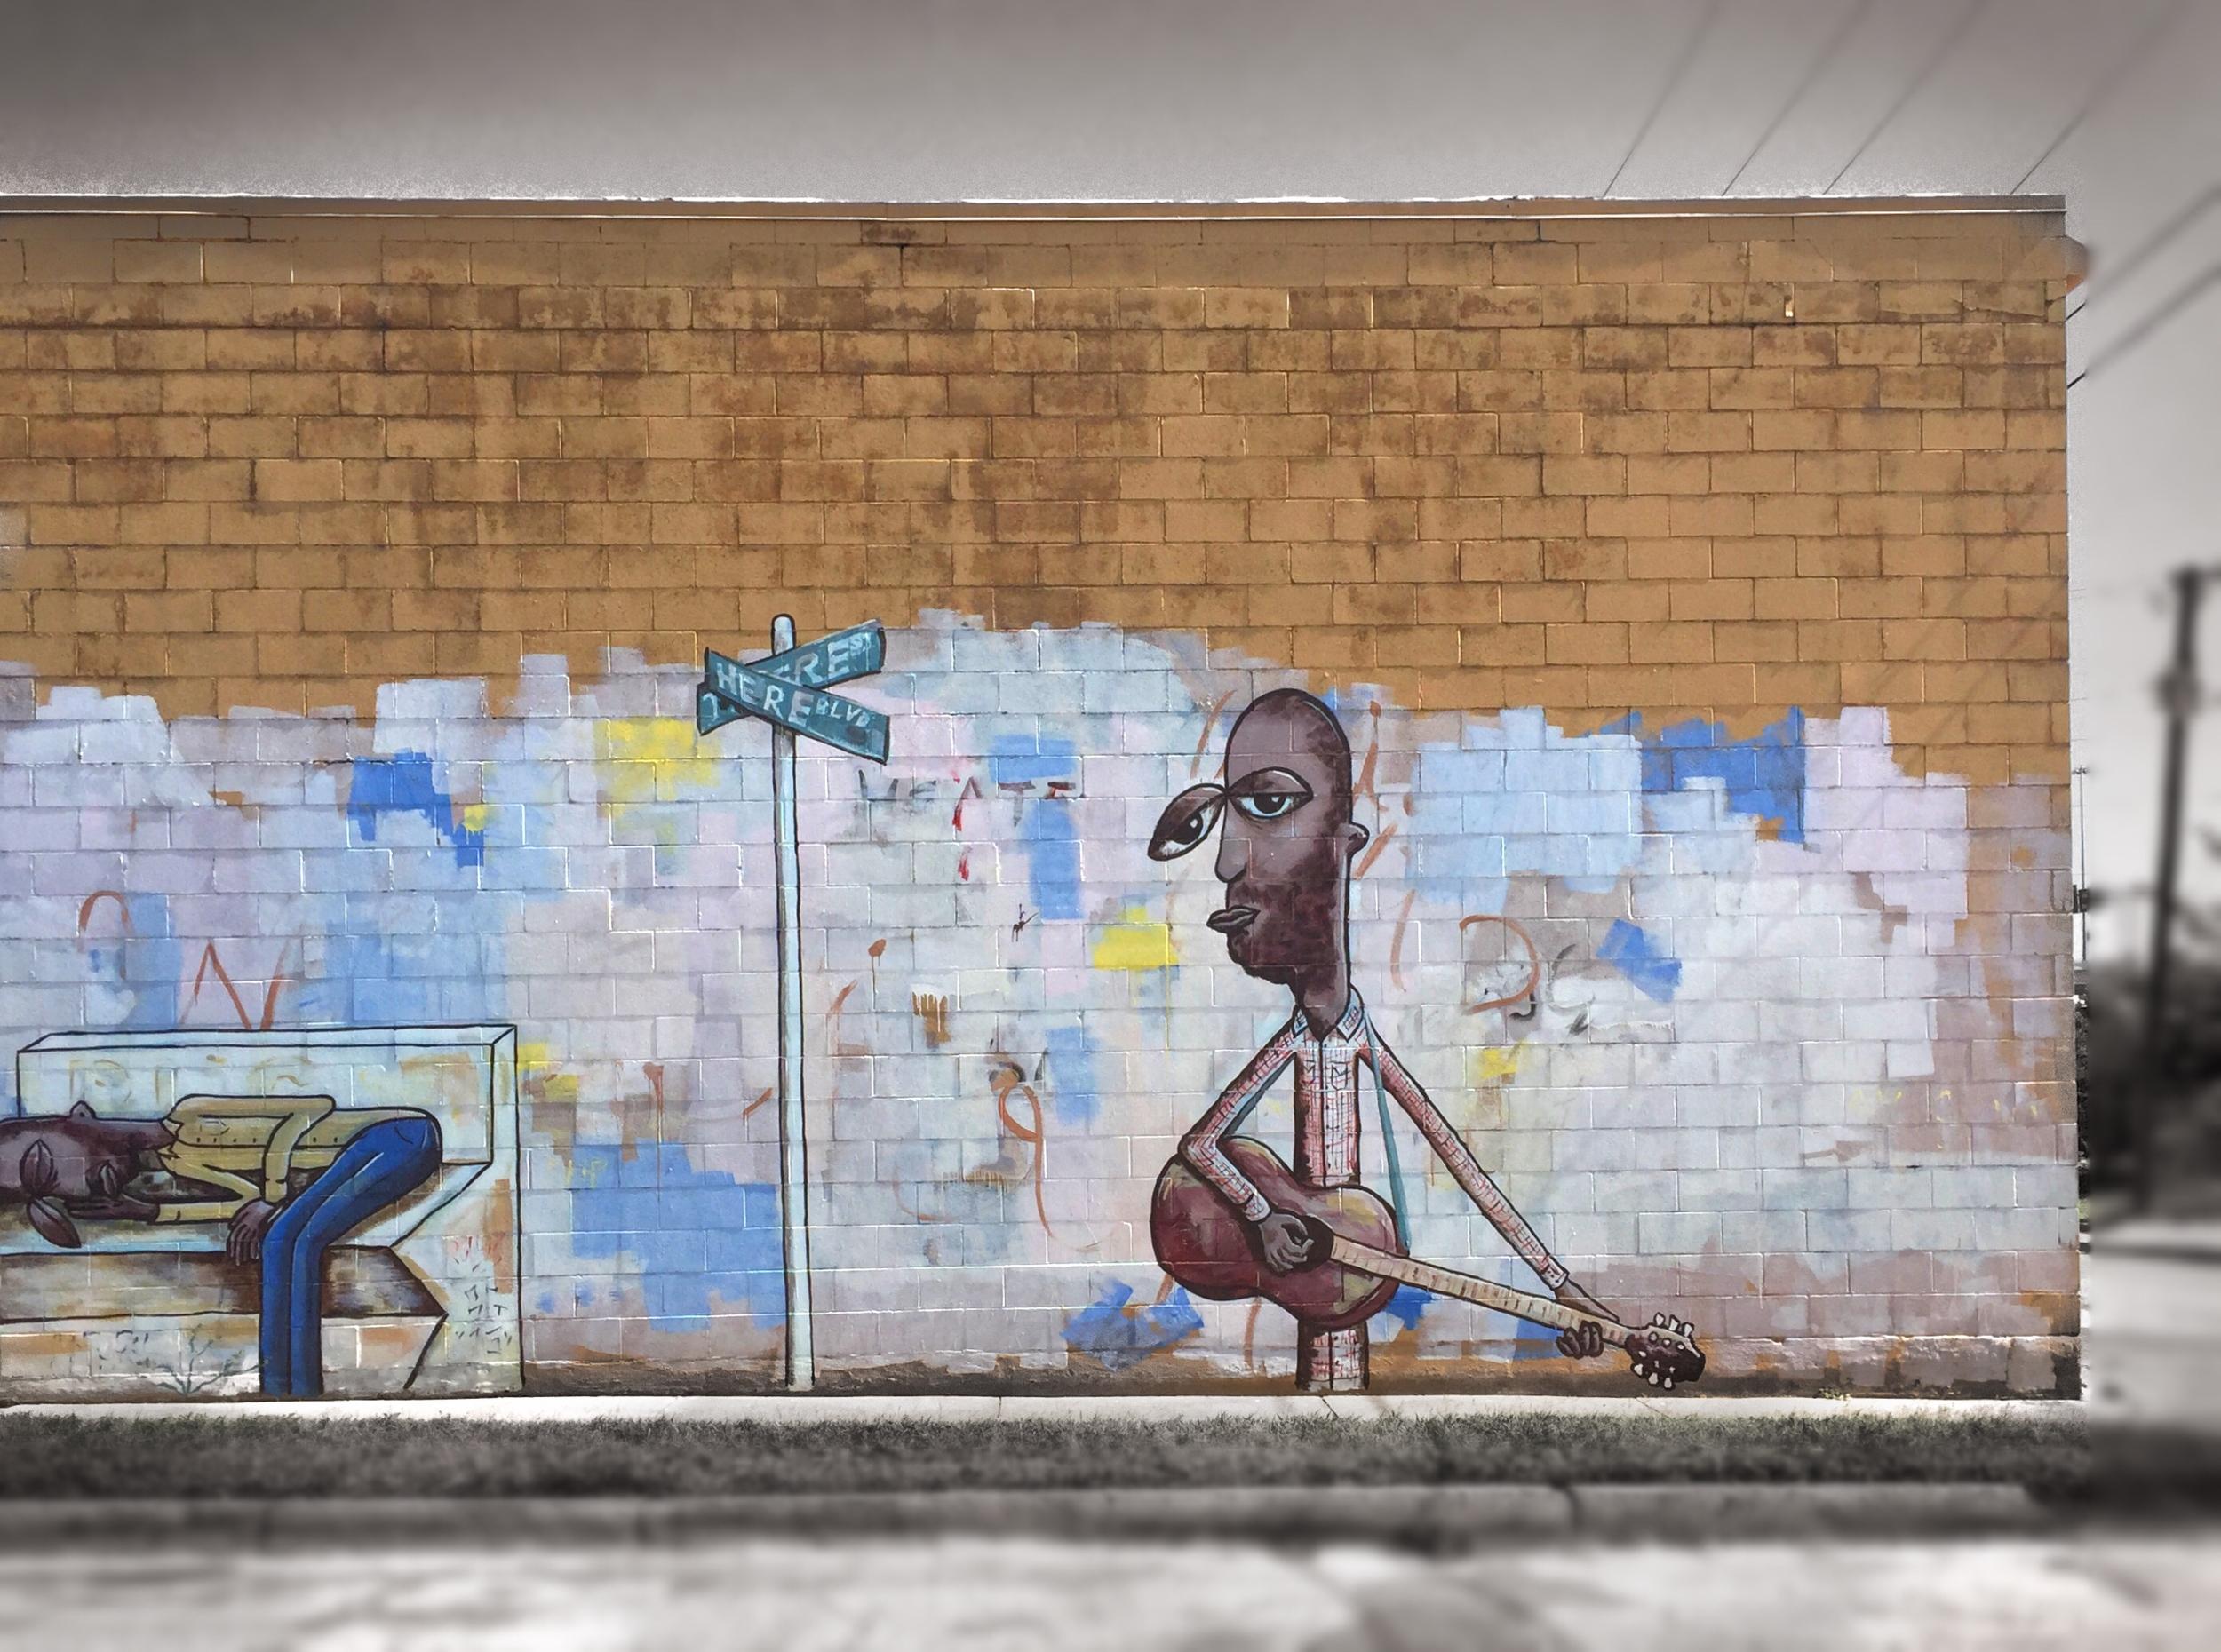 adam-werner-mural-walls-that-talk.jpg